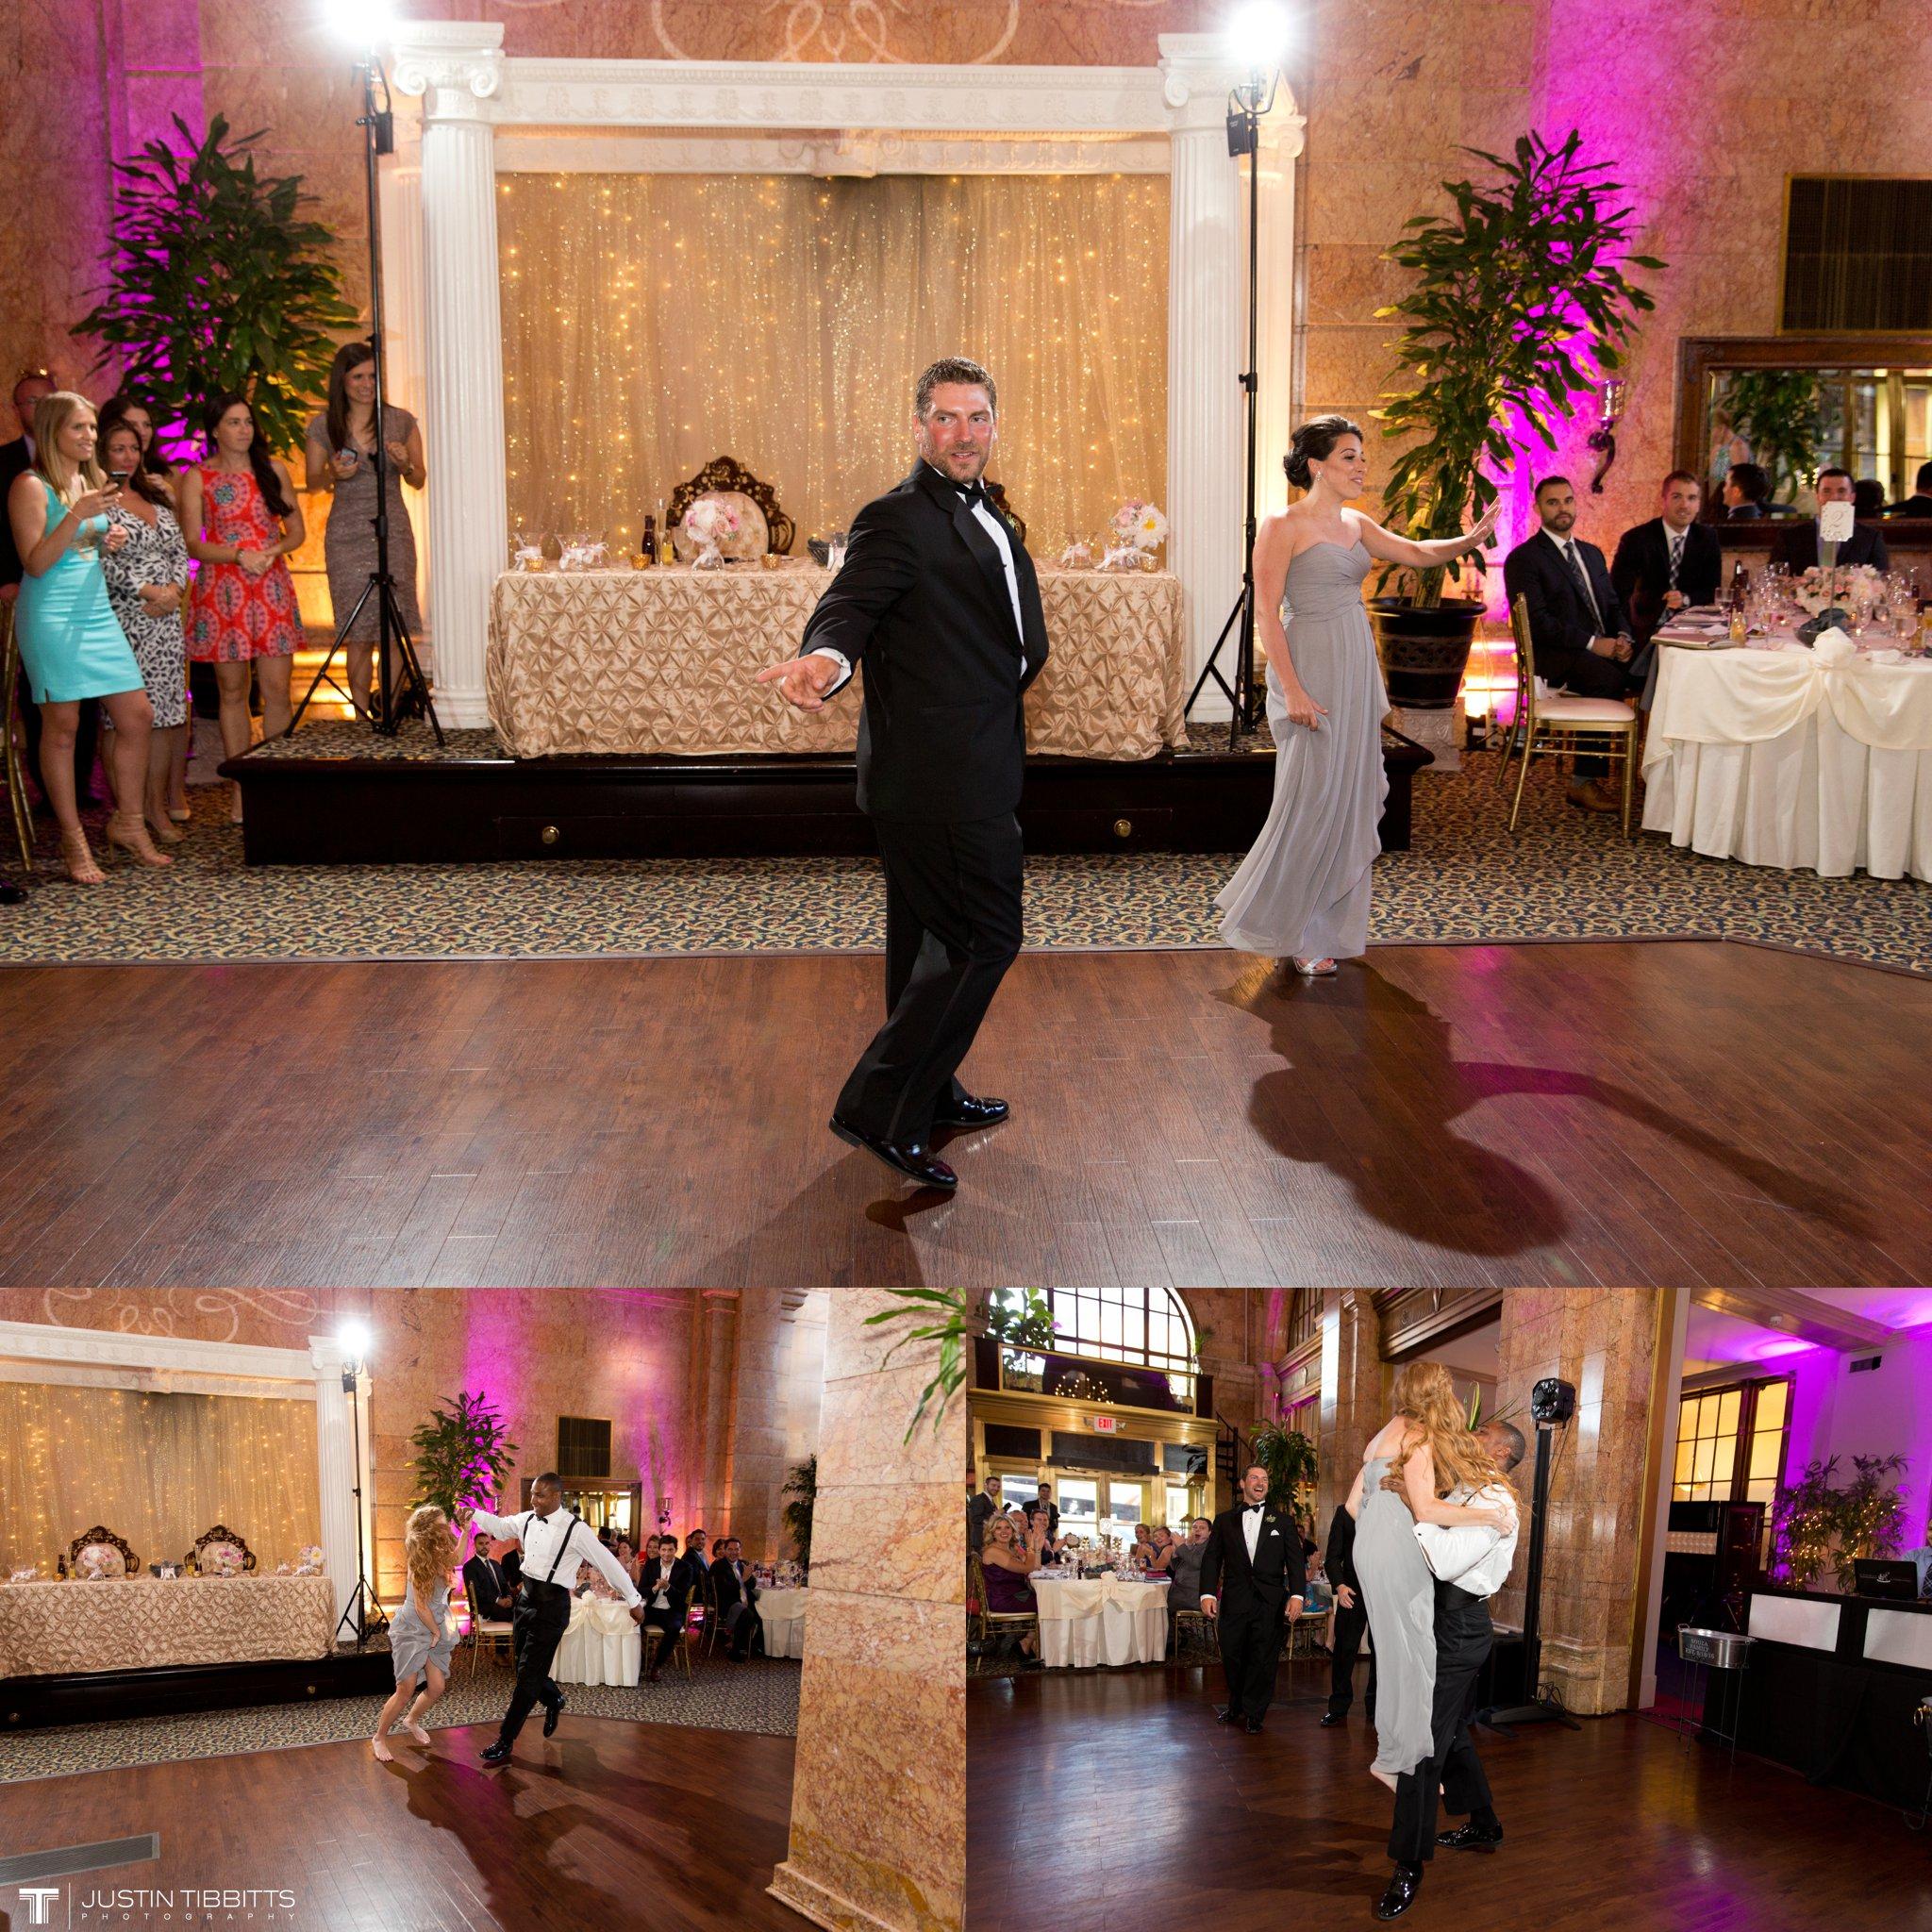 state-room-wedding-photos-with-amanda-and-nick_0143